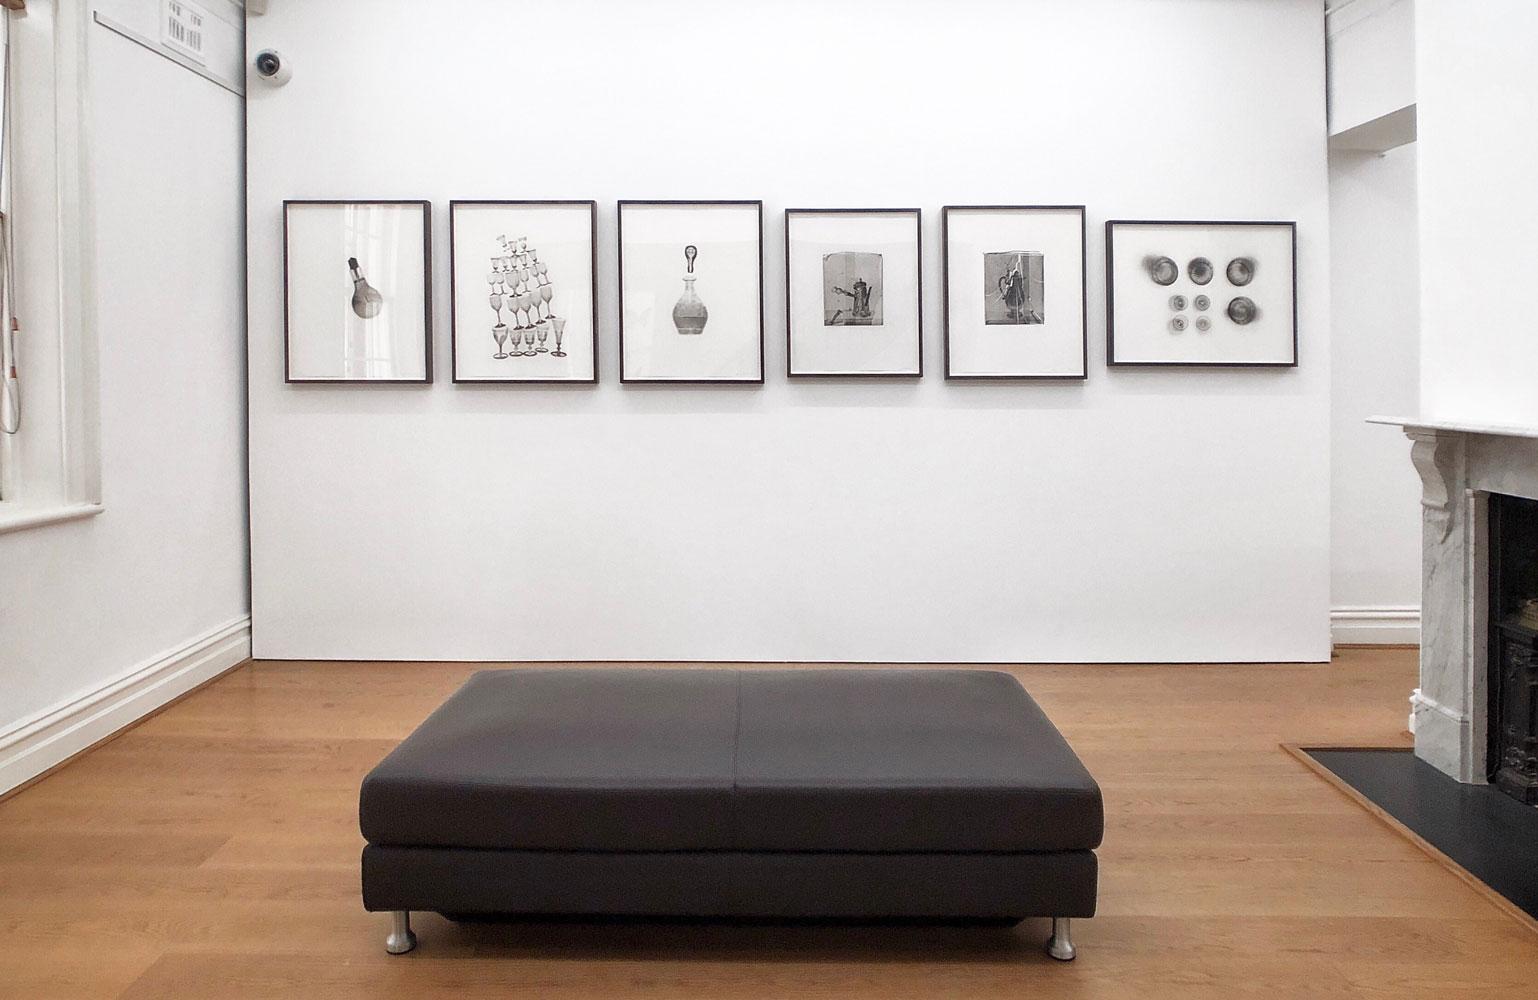 Cornelia Parker Exhibtion at The Sydney Filter